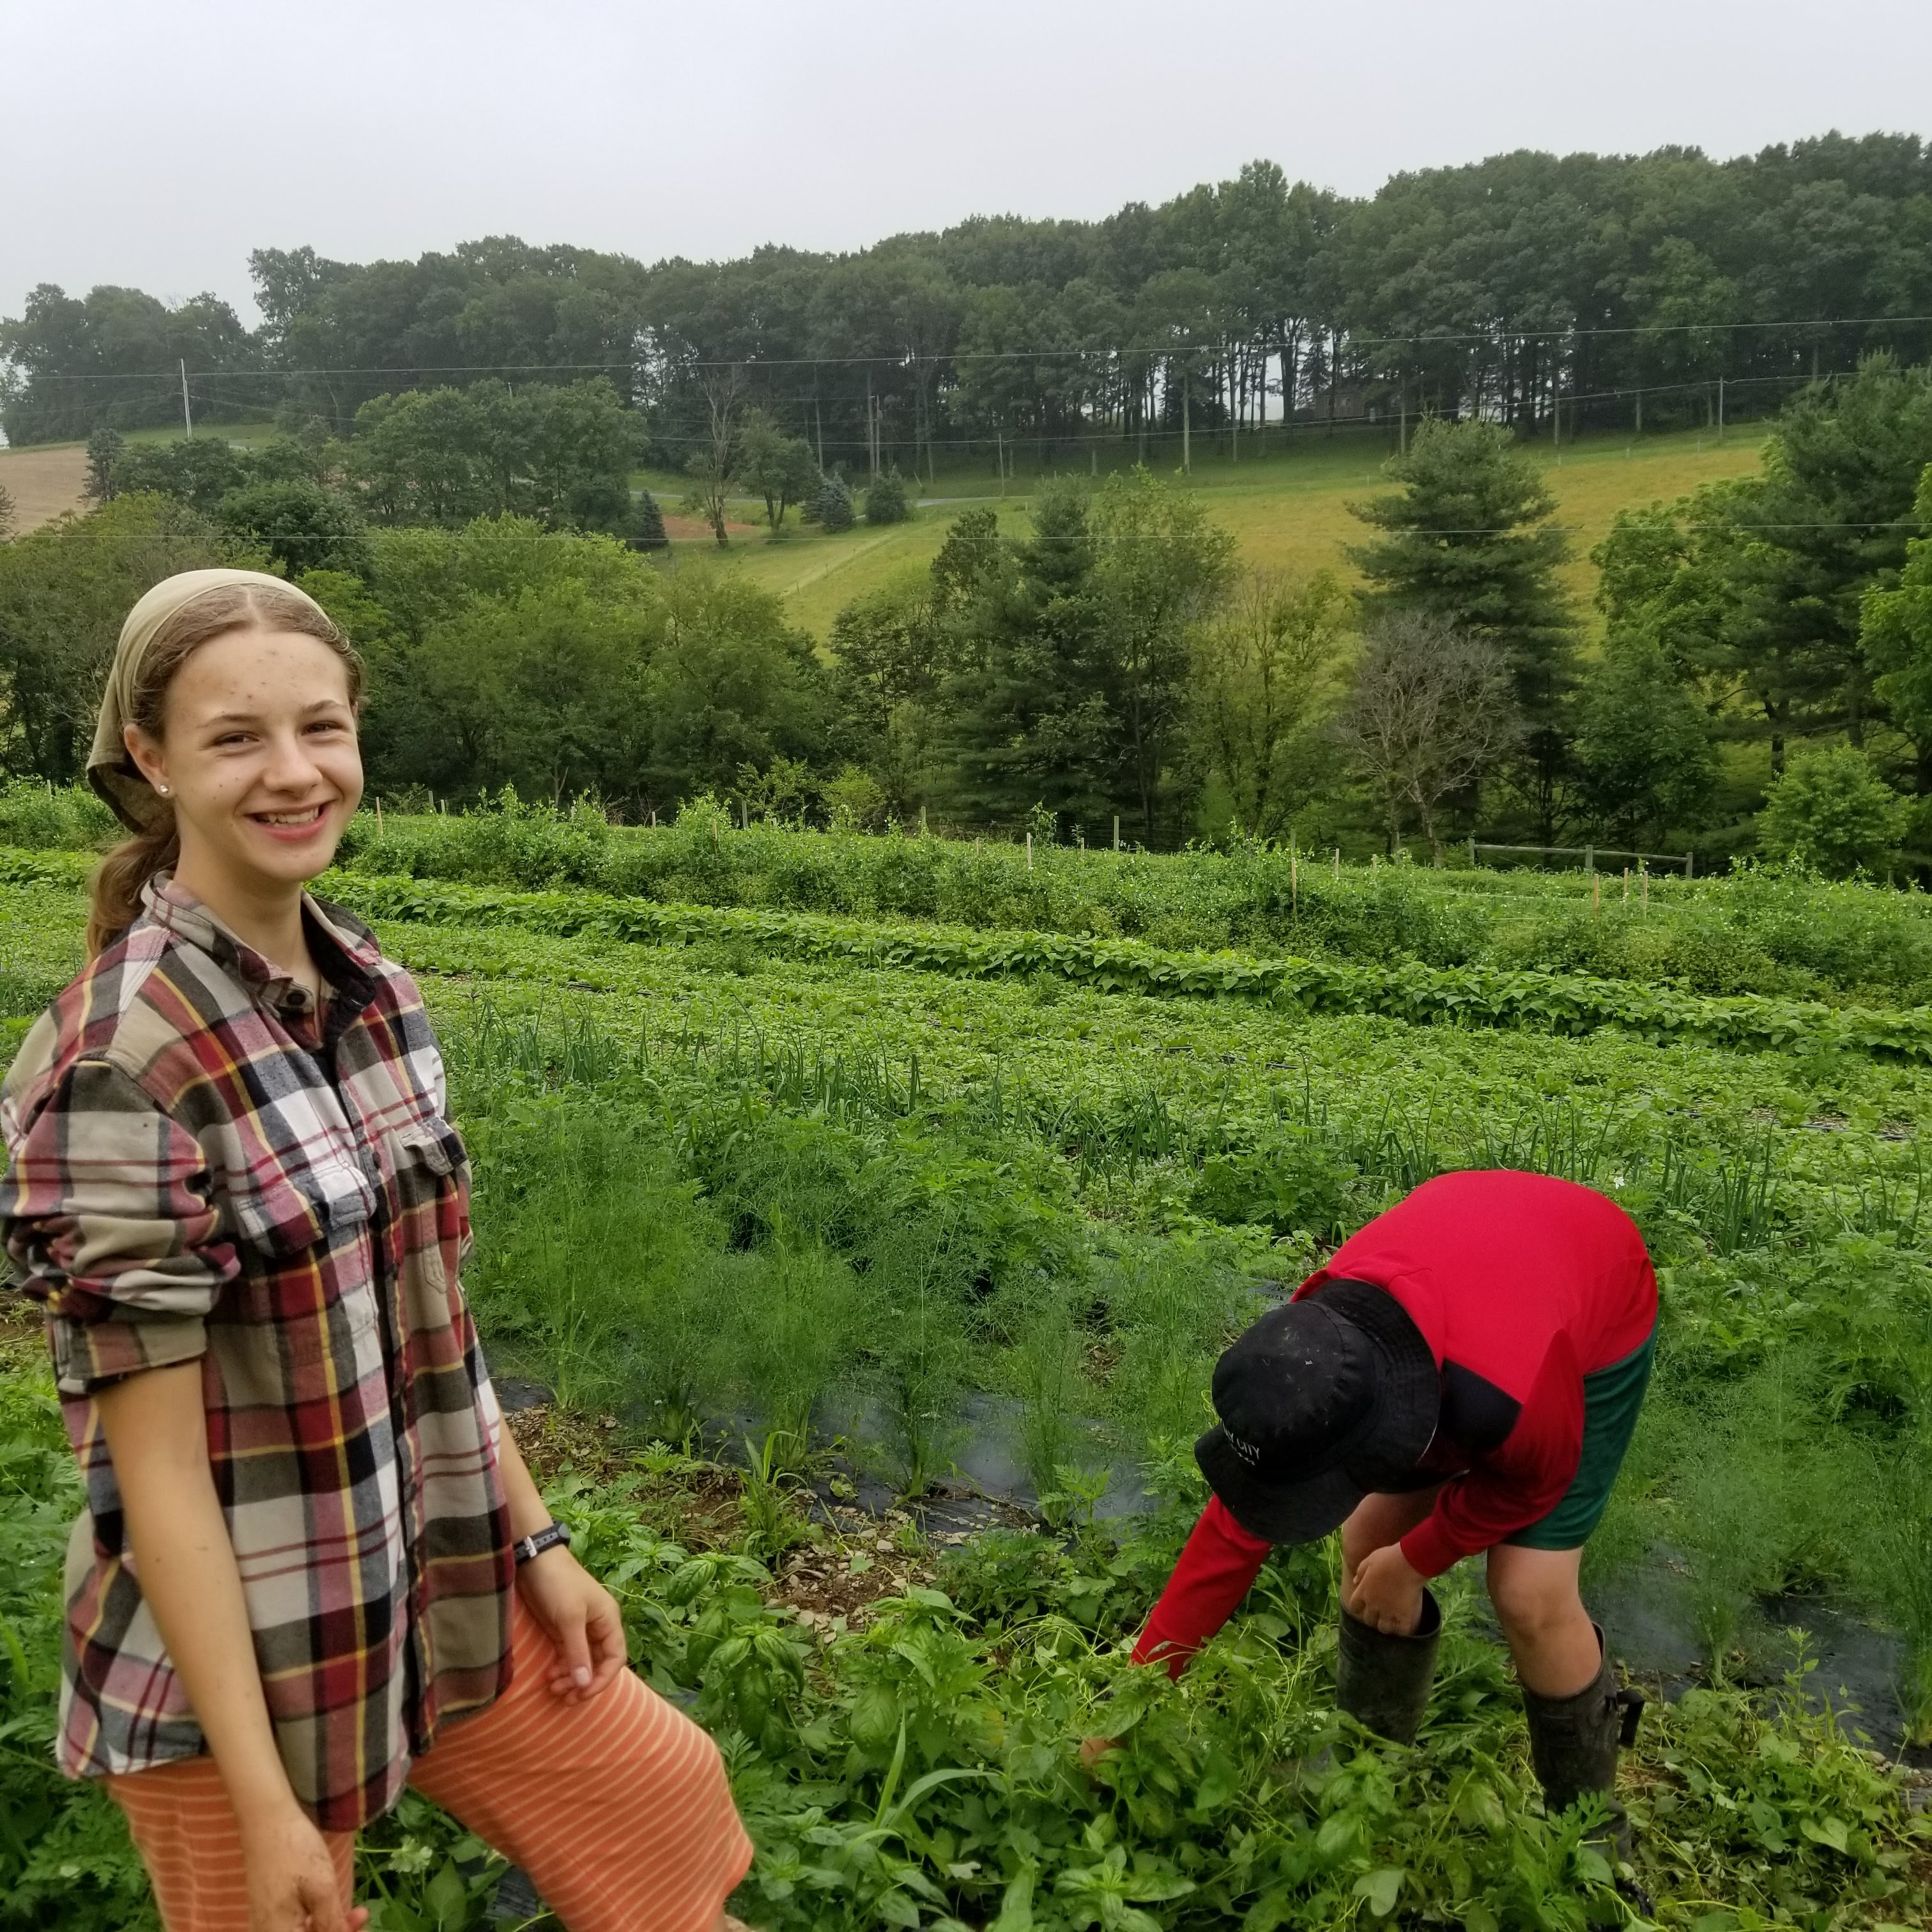 Farm challenges near and far